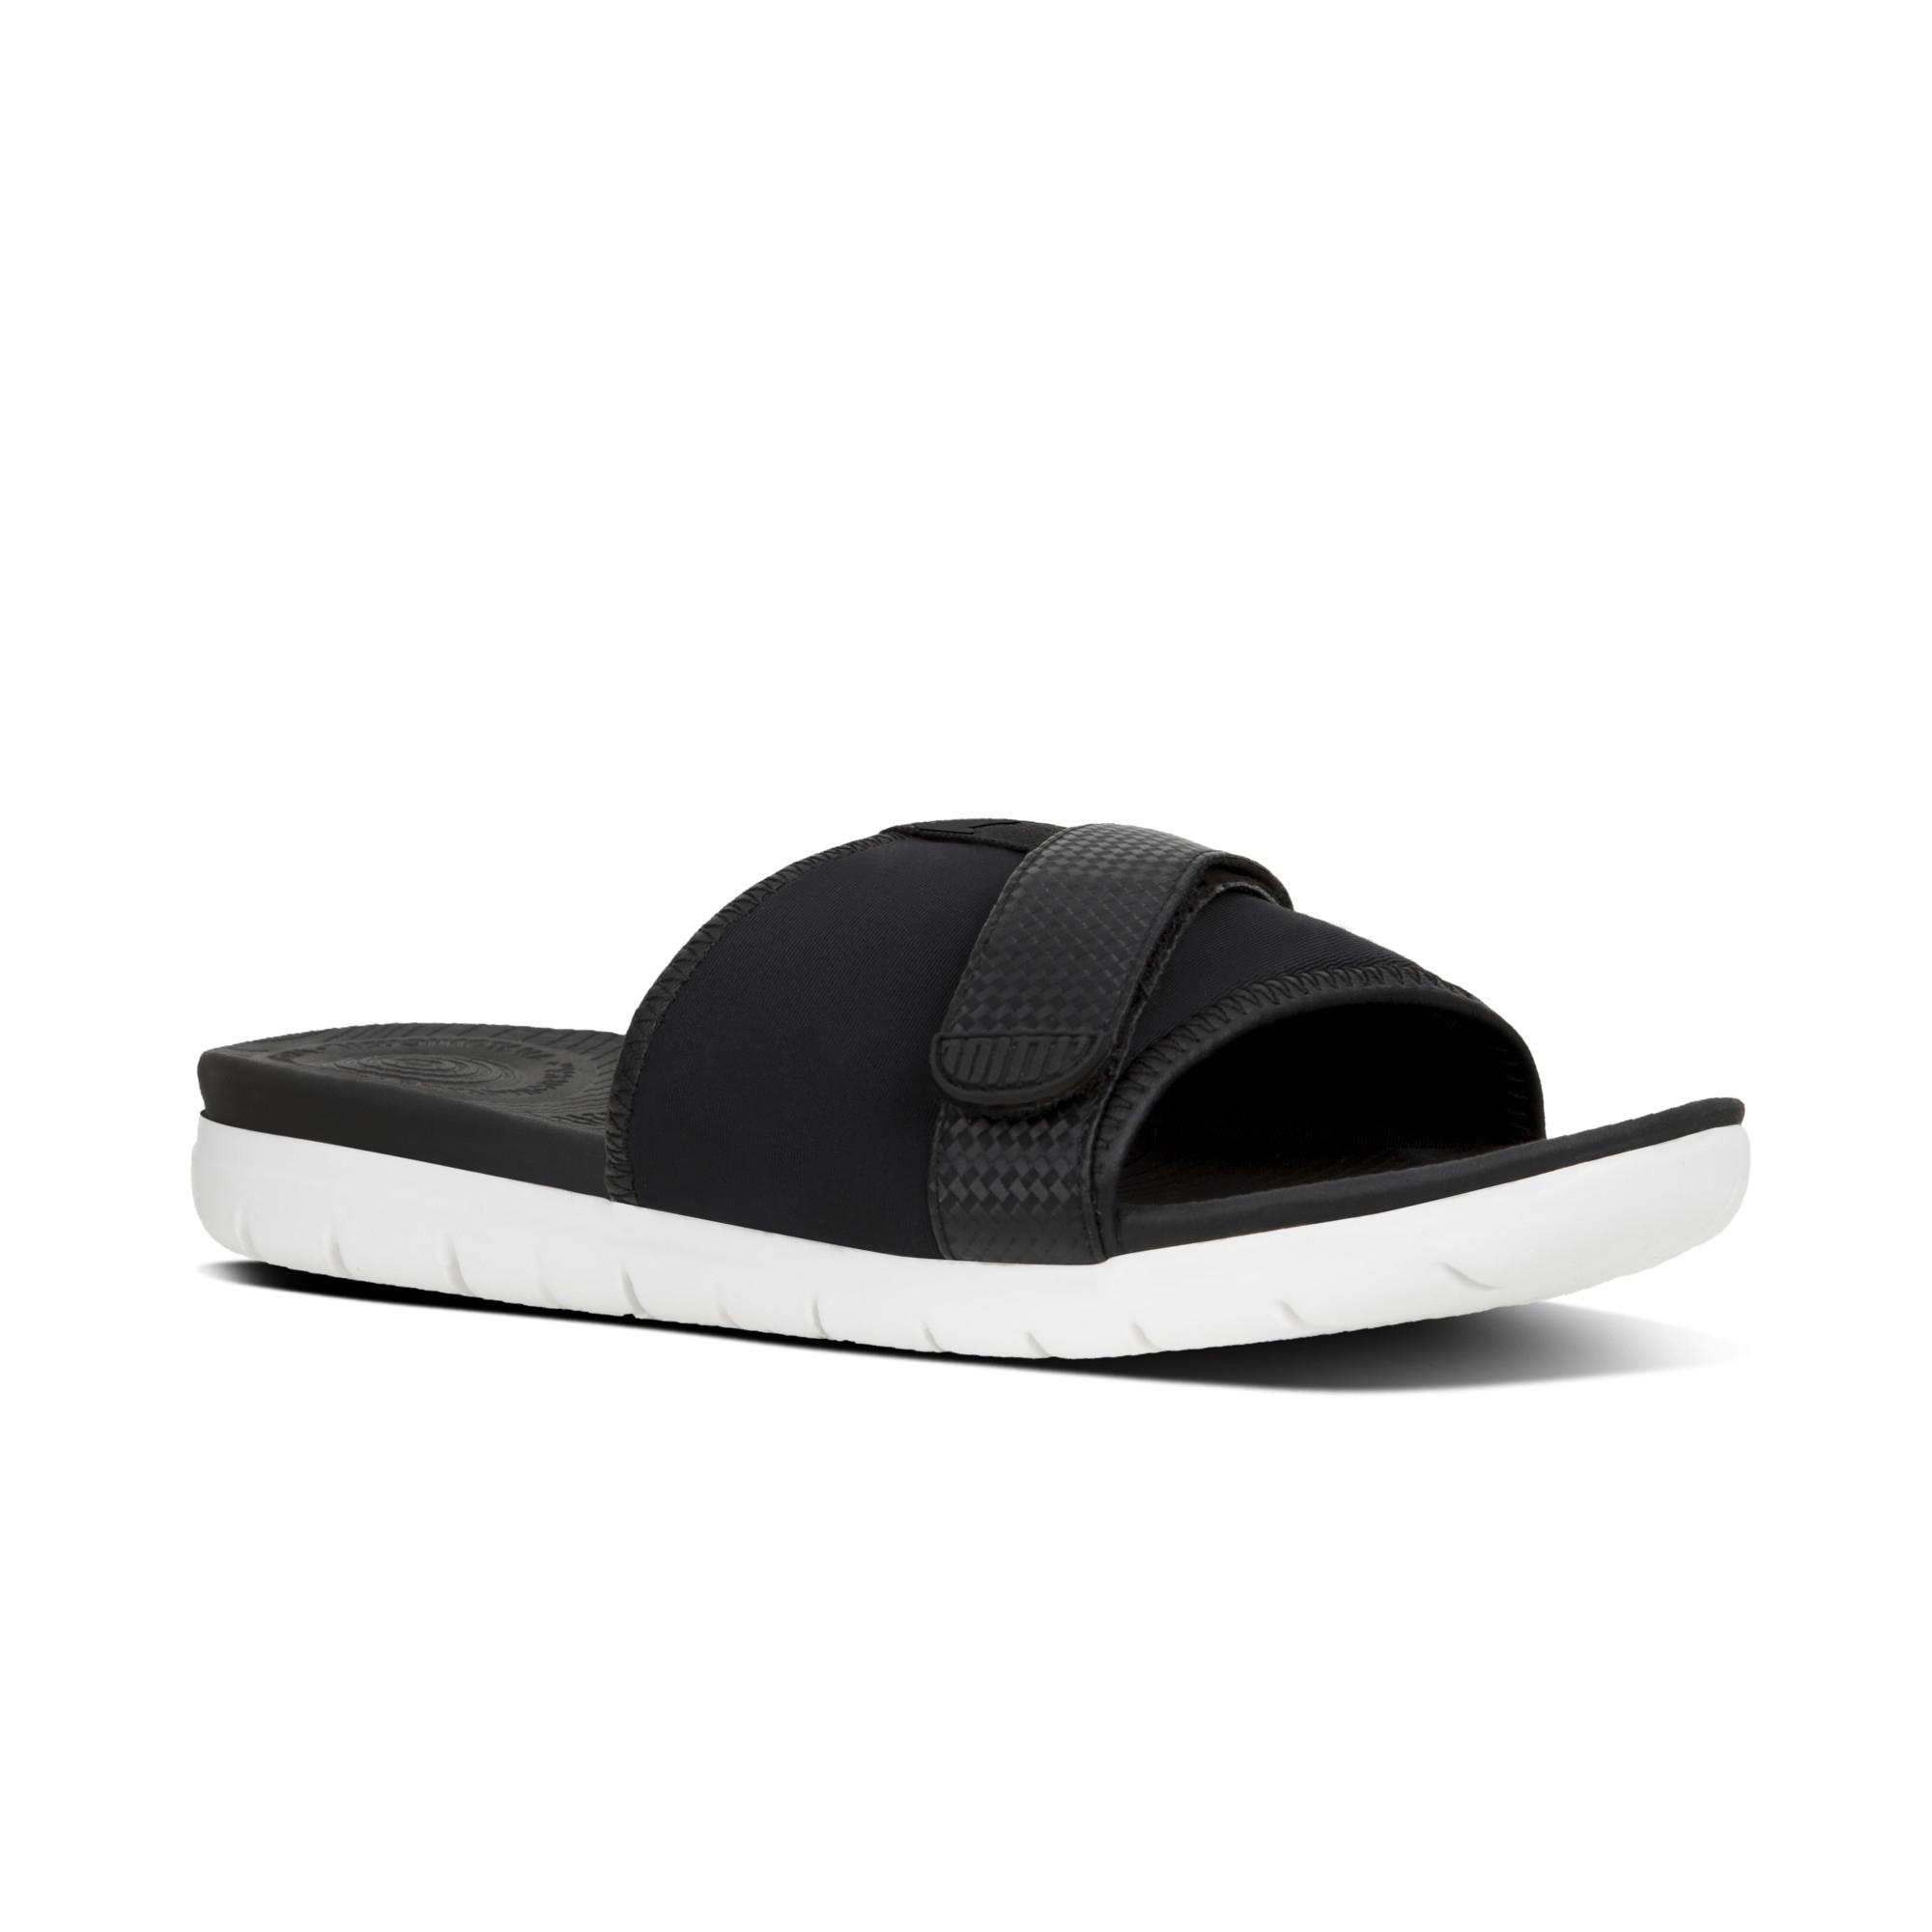 bb5dc4082c4f FitFlop™ NEOFLEX™ Ladies Slide Sandals Black